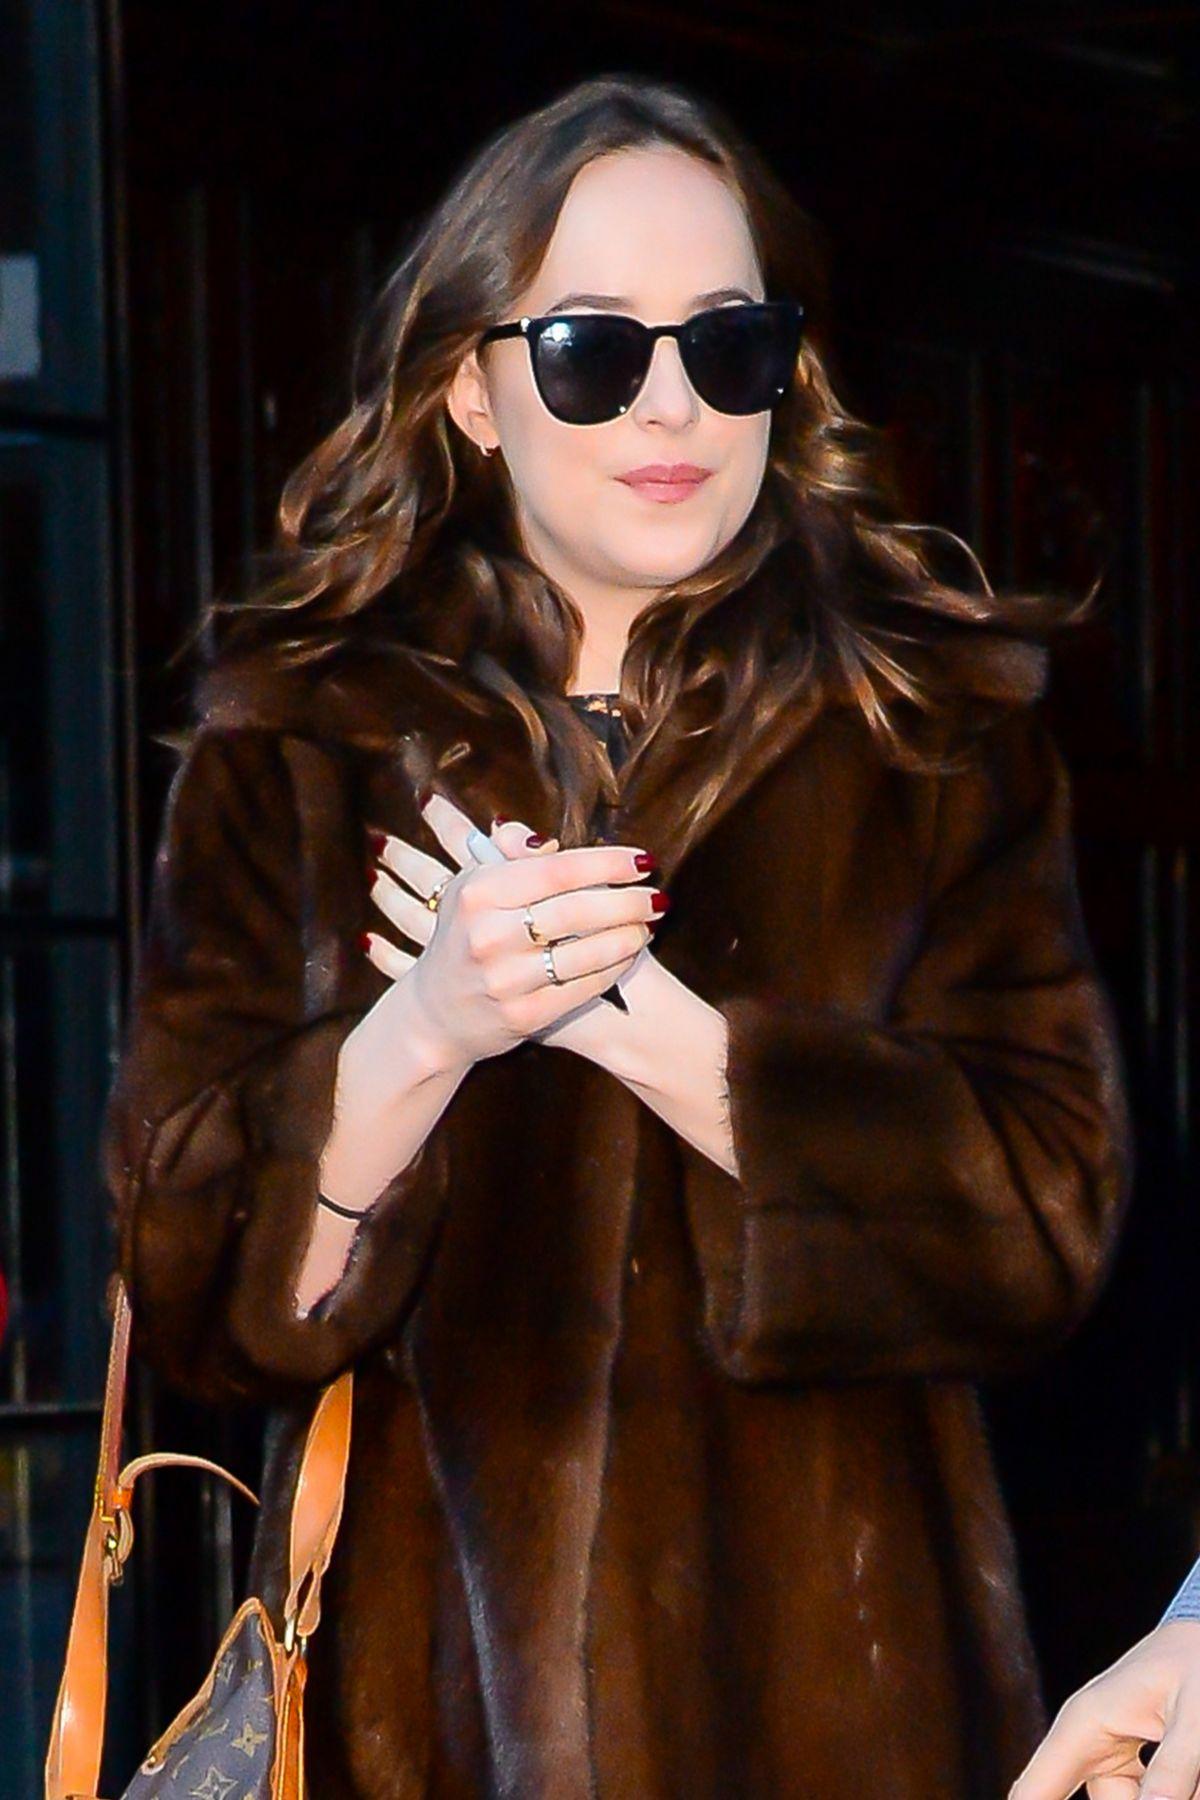 Dakota johnson leaving the bowery hotel in nyc - 2019 year